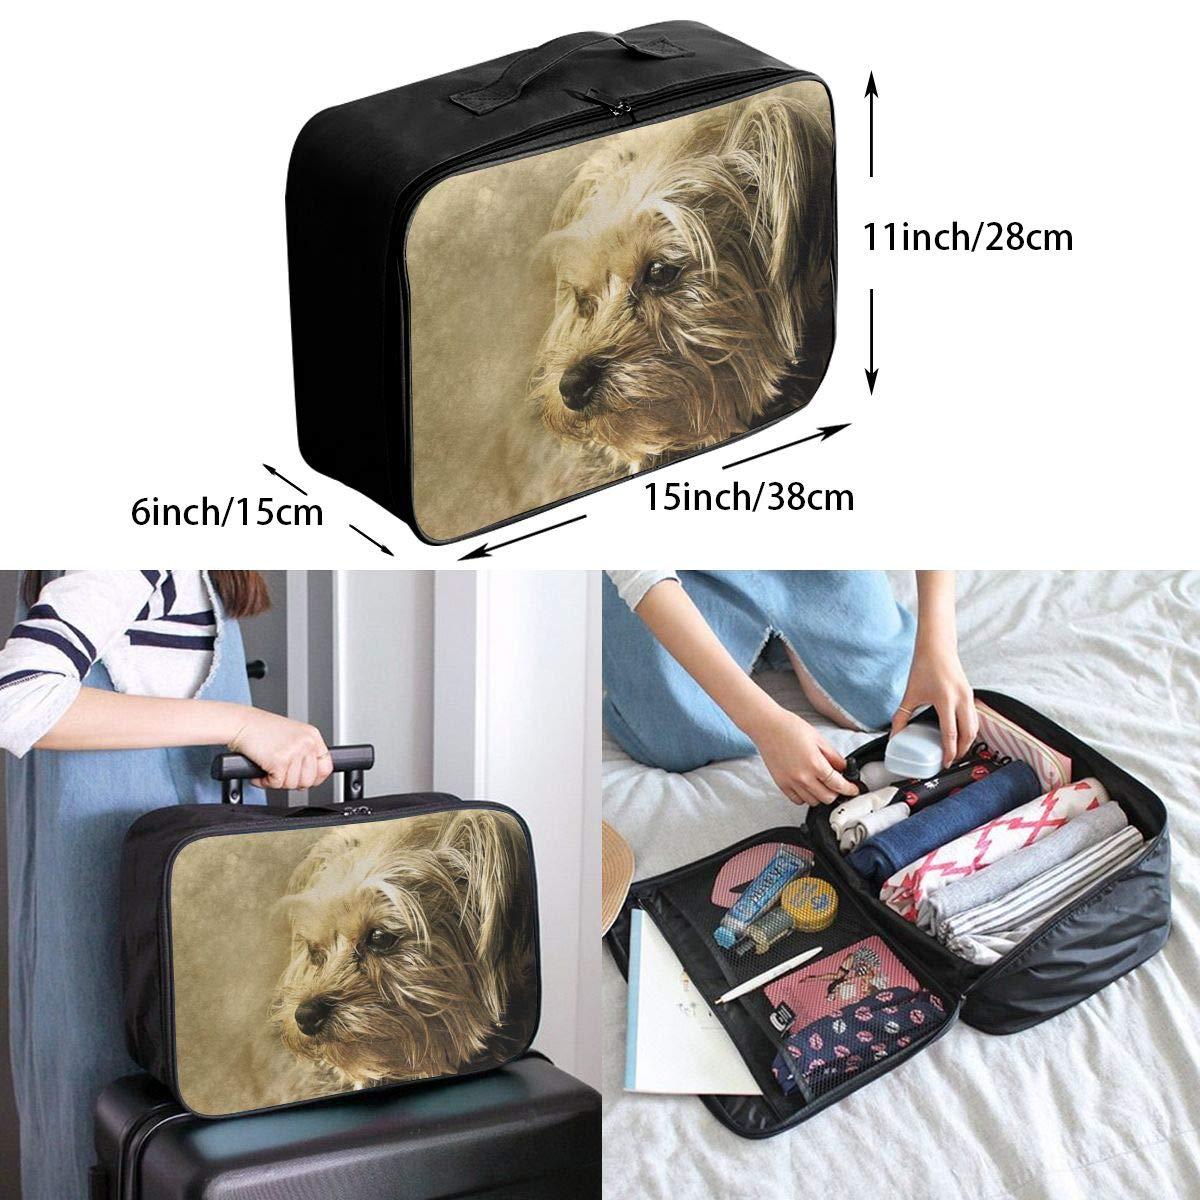 Animal Creative Texture Art Travel Lightweight Waterproof Foldable Storage Carry Luggage Large Capacity Portable Luggage Bag Duffel Bag